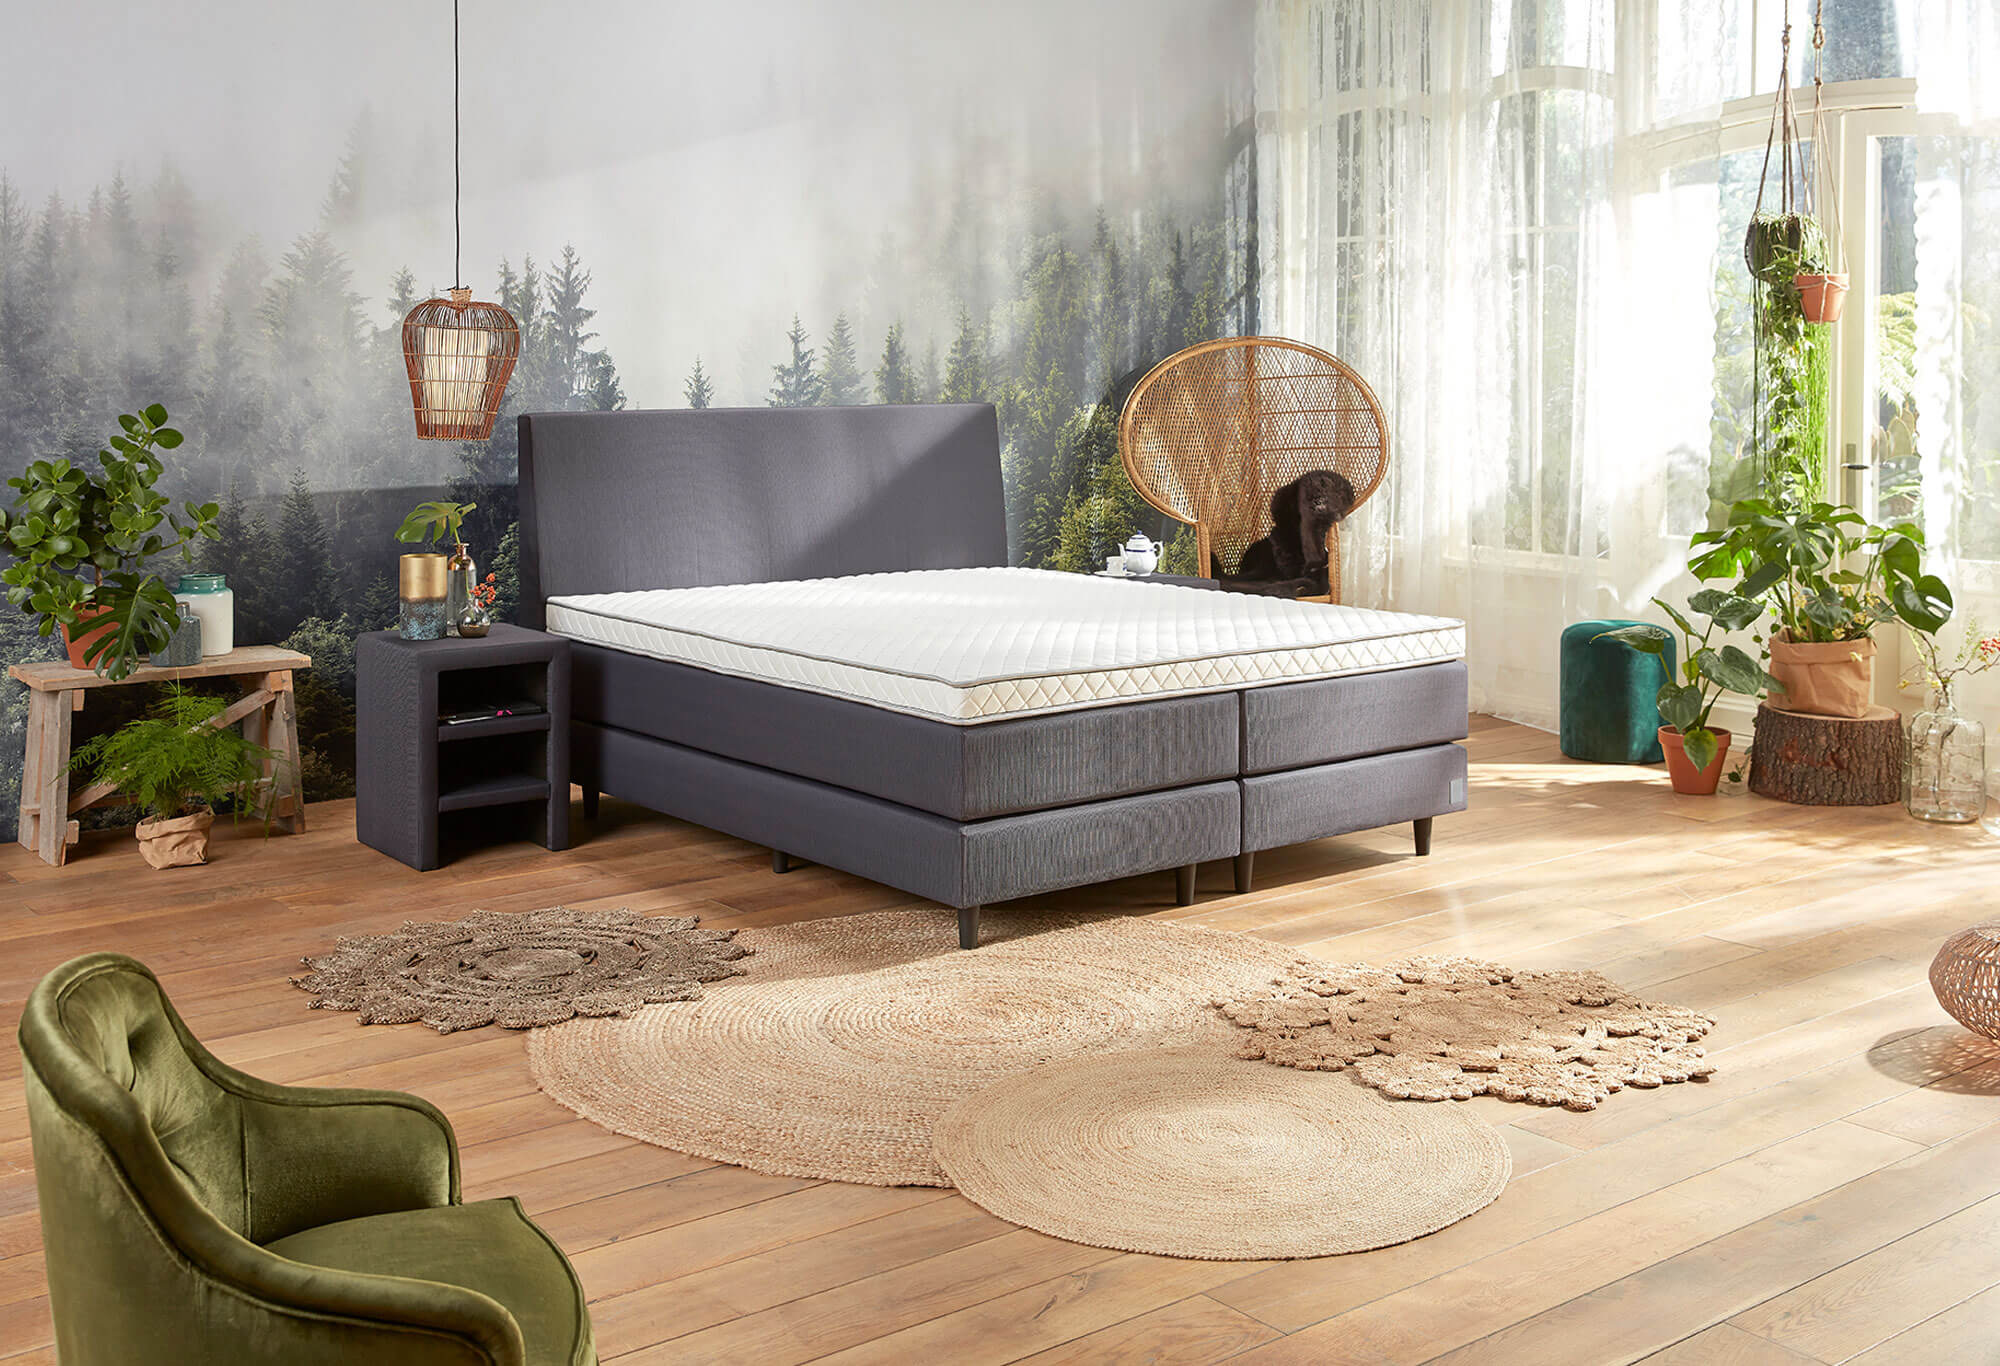 jubileumboxspring edition i swiss sense gratis montage. Black Bedroom Furniture Sets. Home Design Ideas